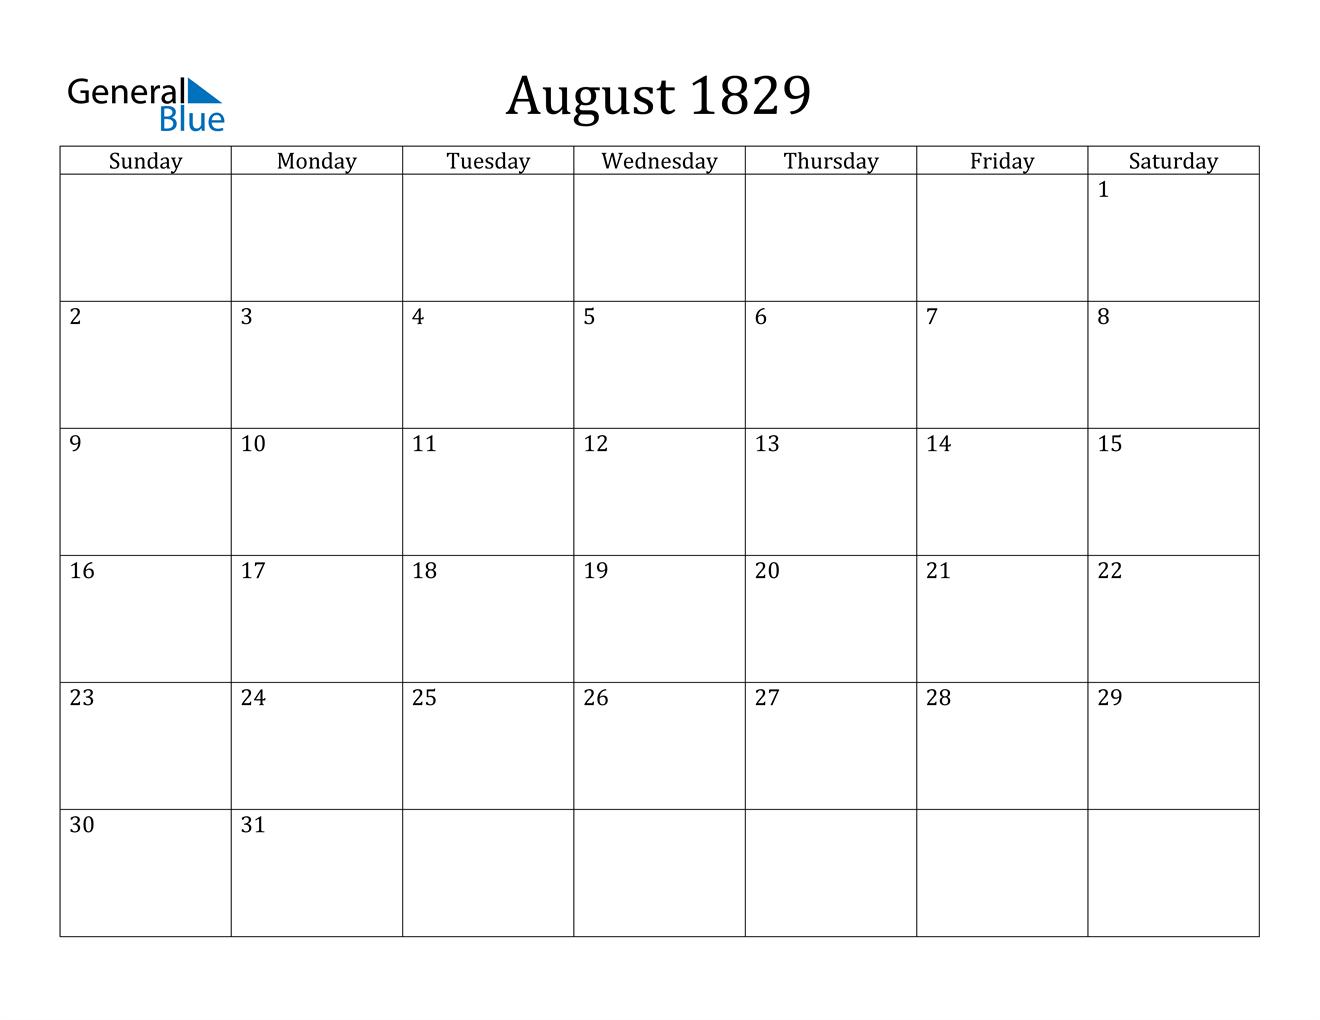 Image of August 1829 Calendar